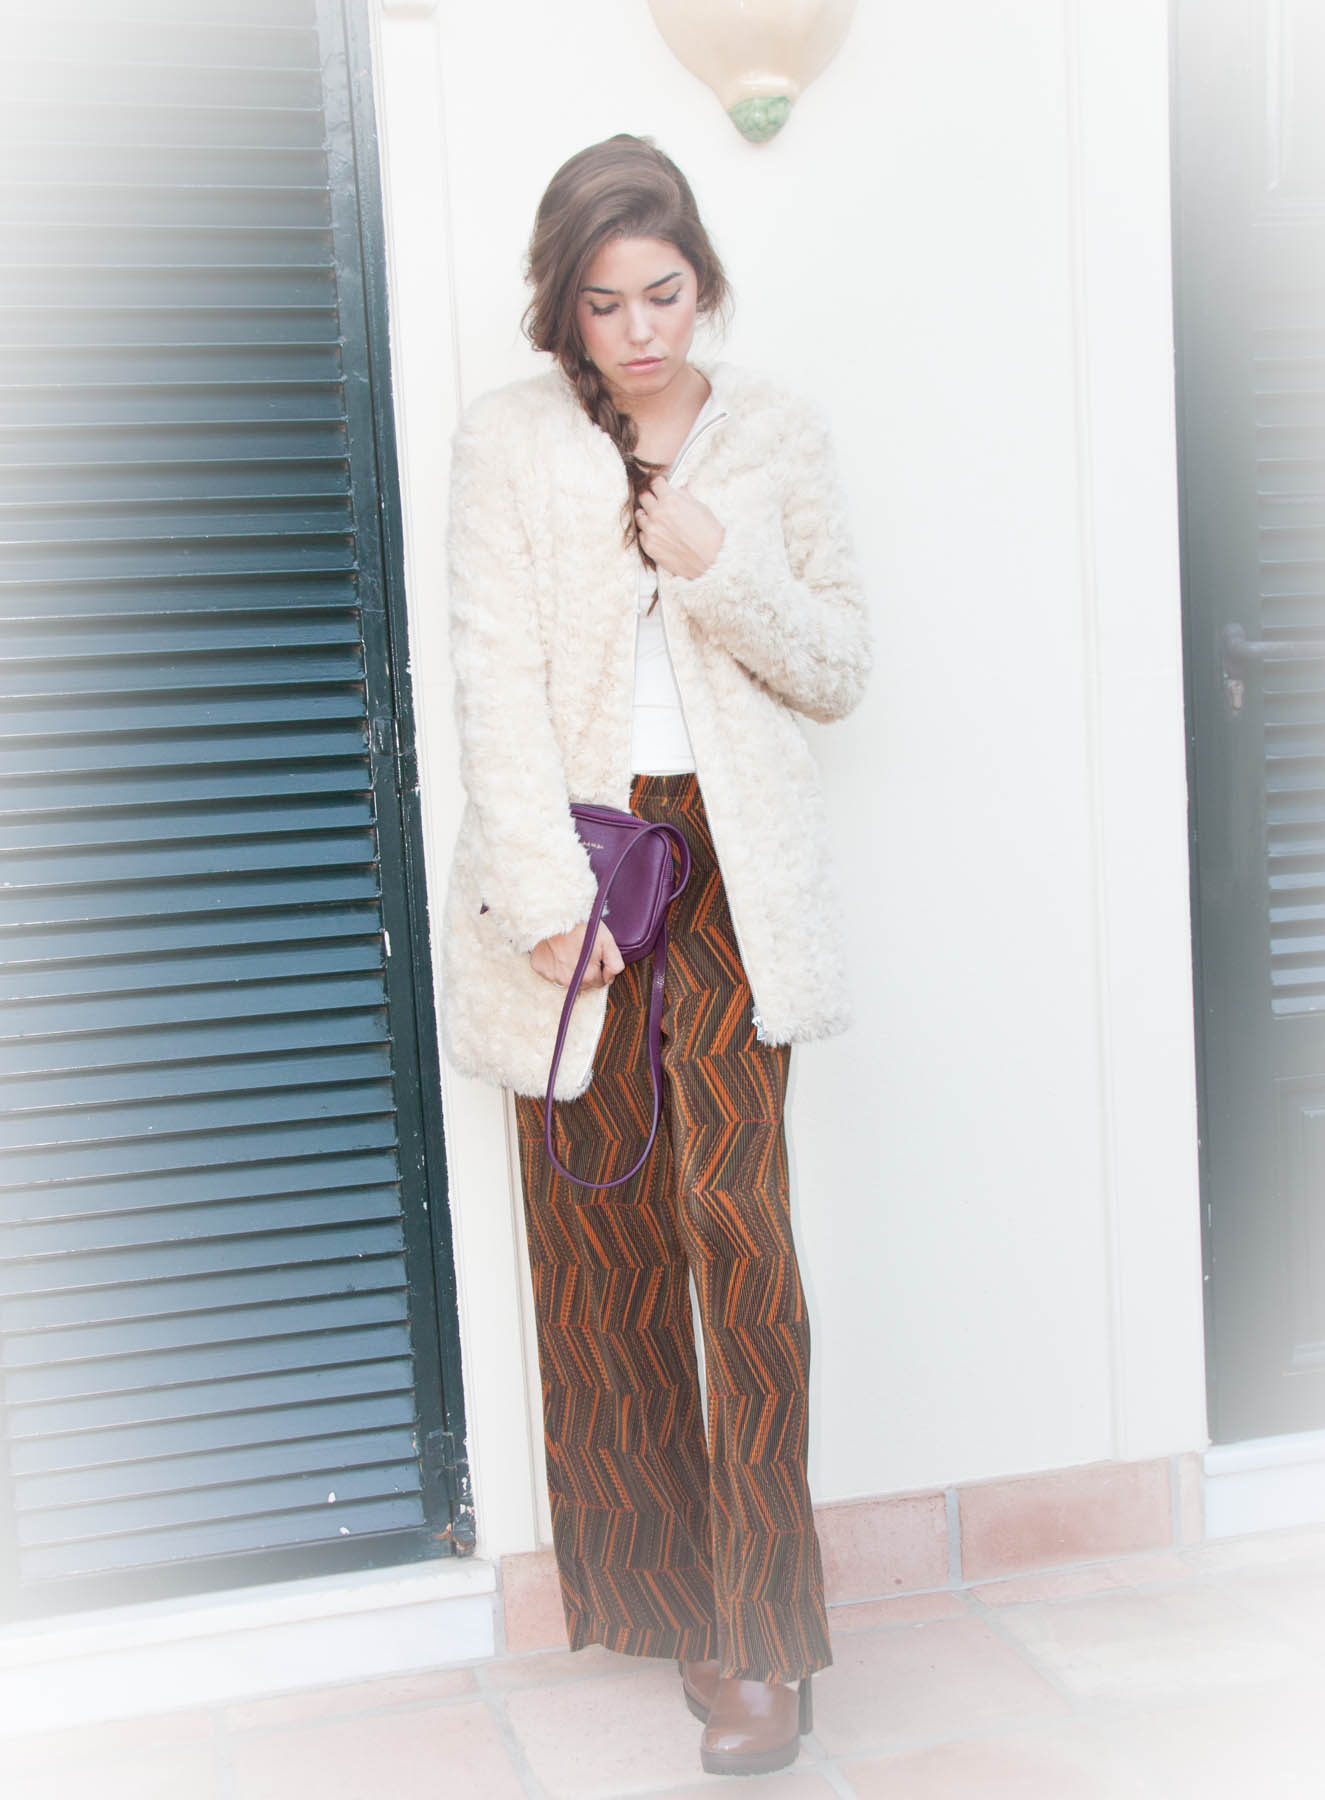 Troussers/pantalones: Zara